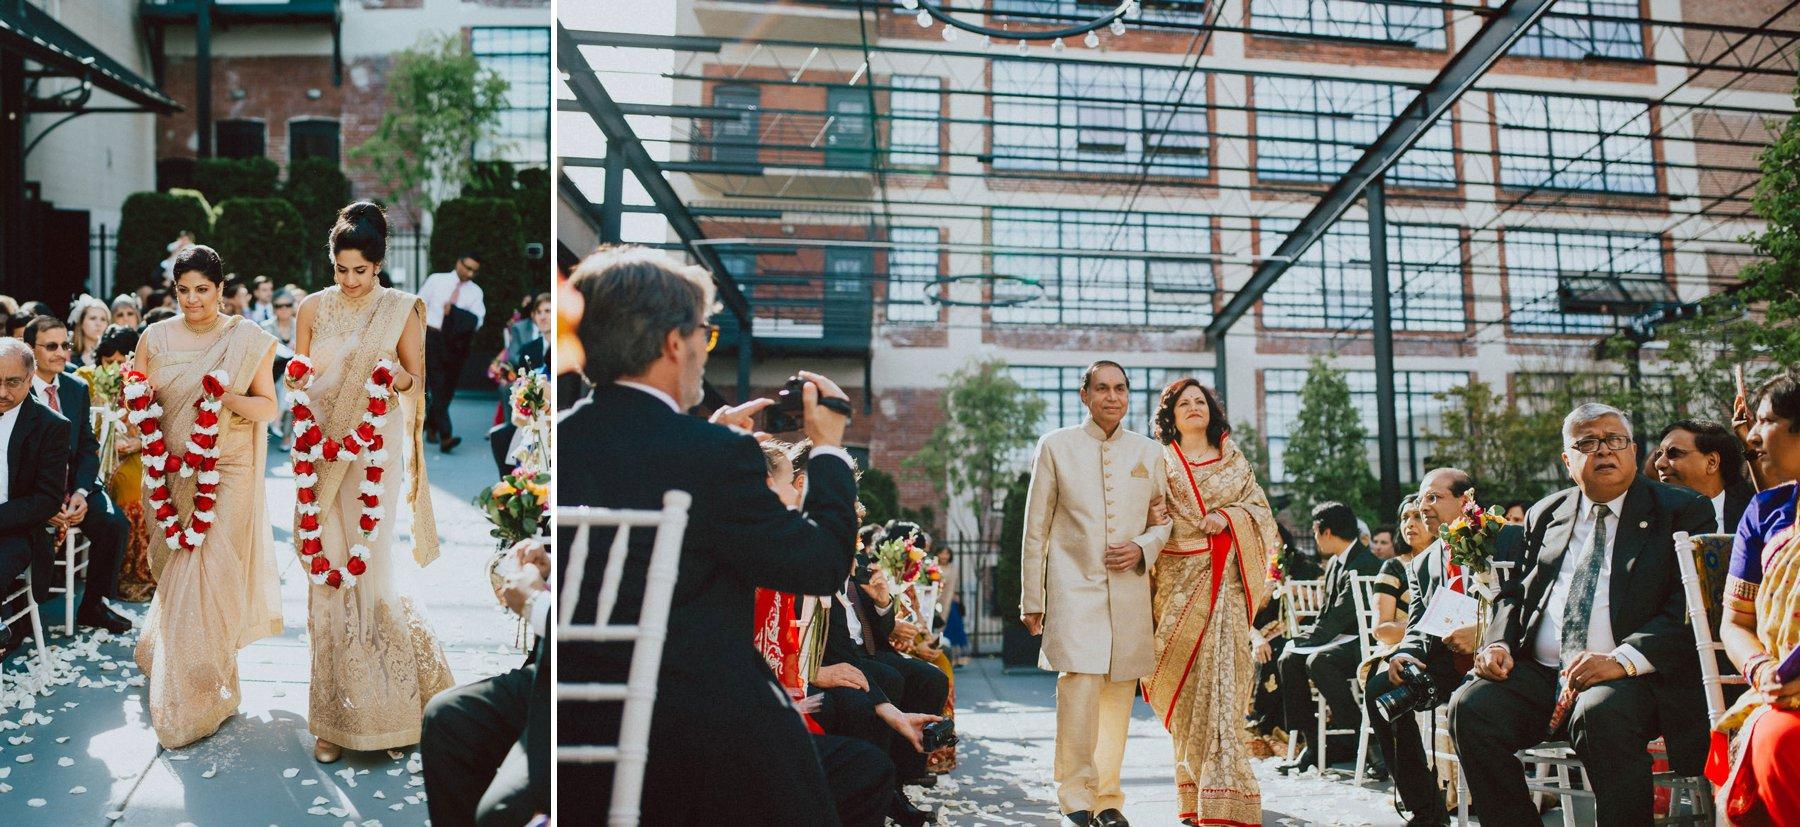 vie-philadelphia-indian-wedding-70.jpg